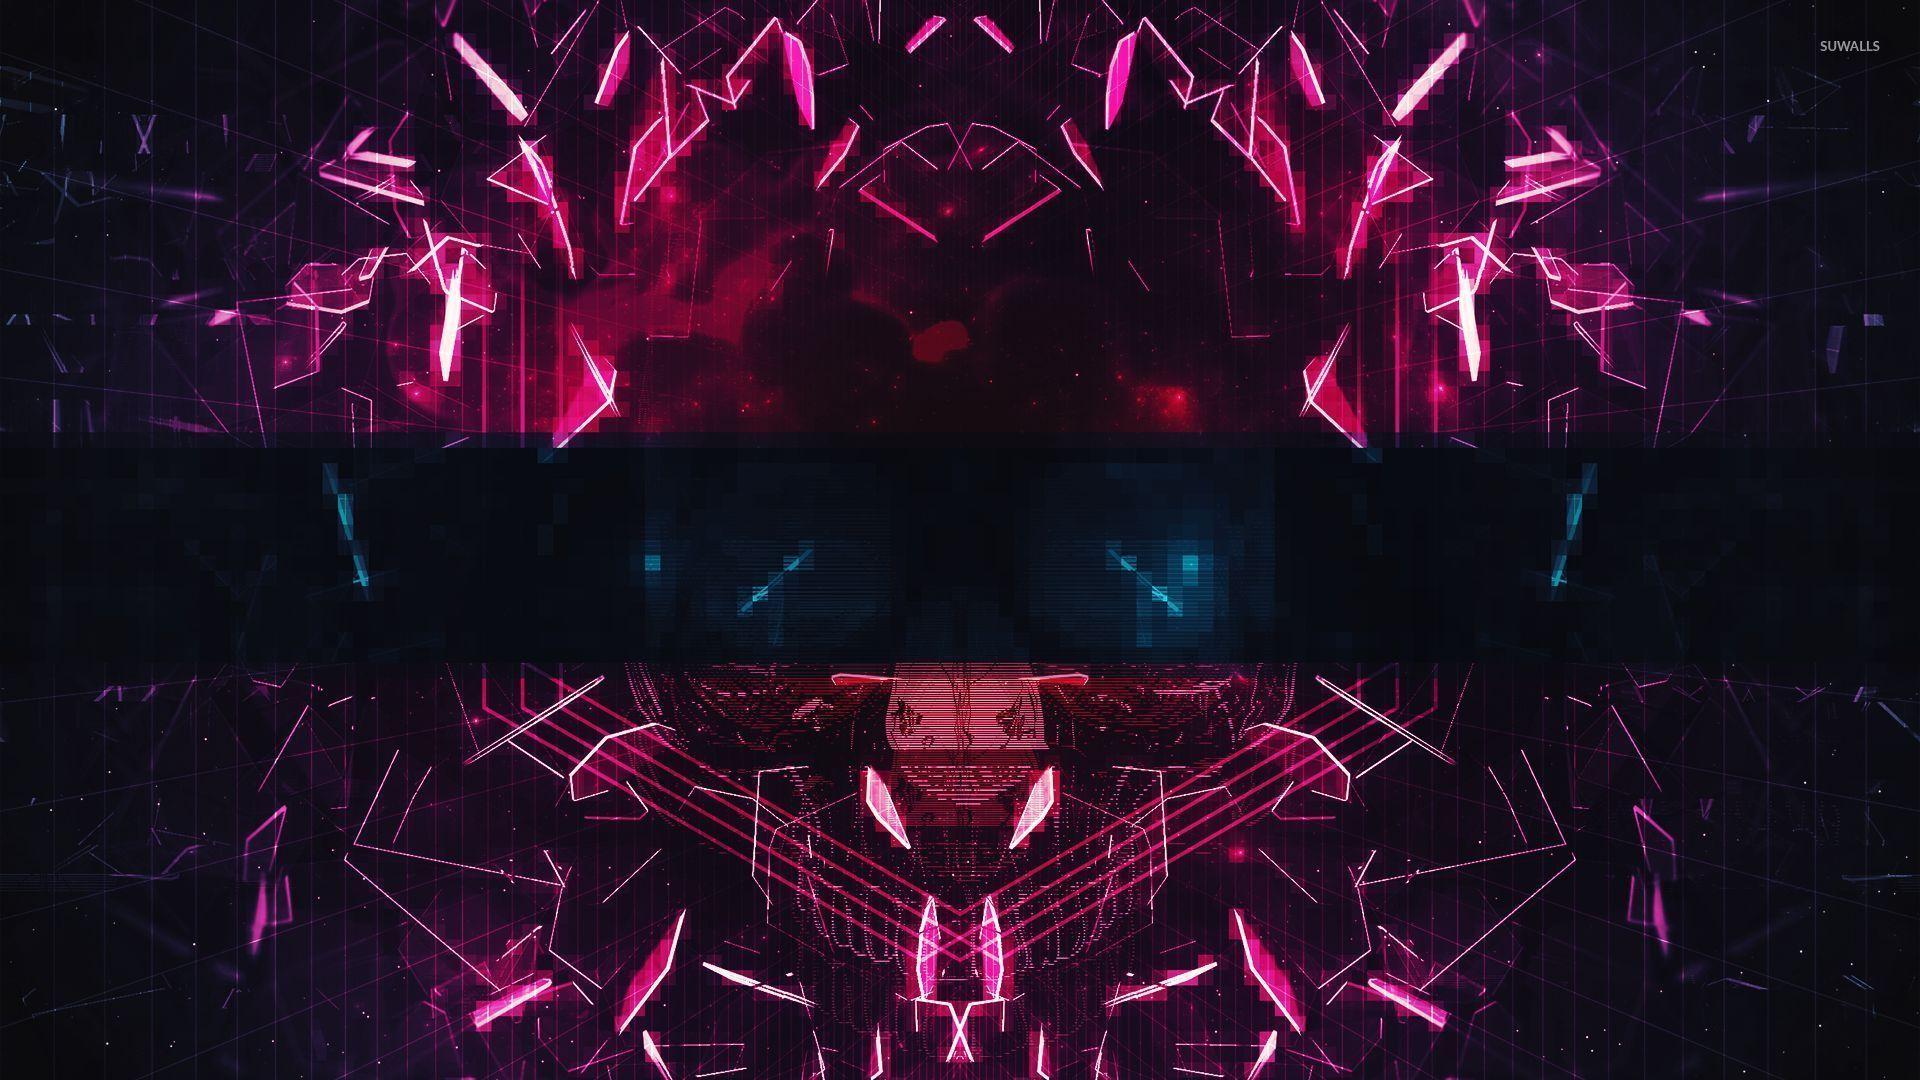 Neon Mask Made Of Shards Wallpaper Digital Art Wallpapers